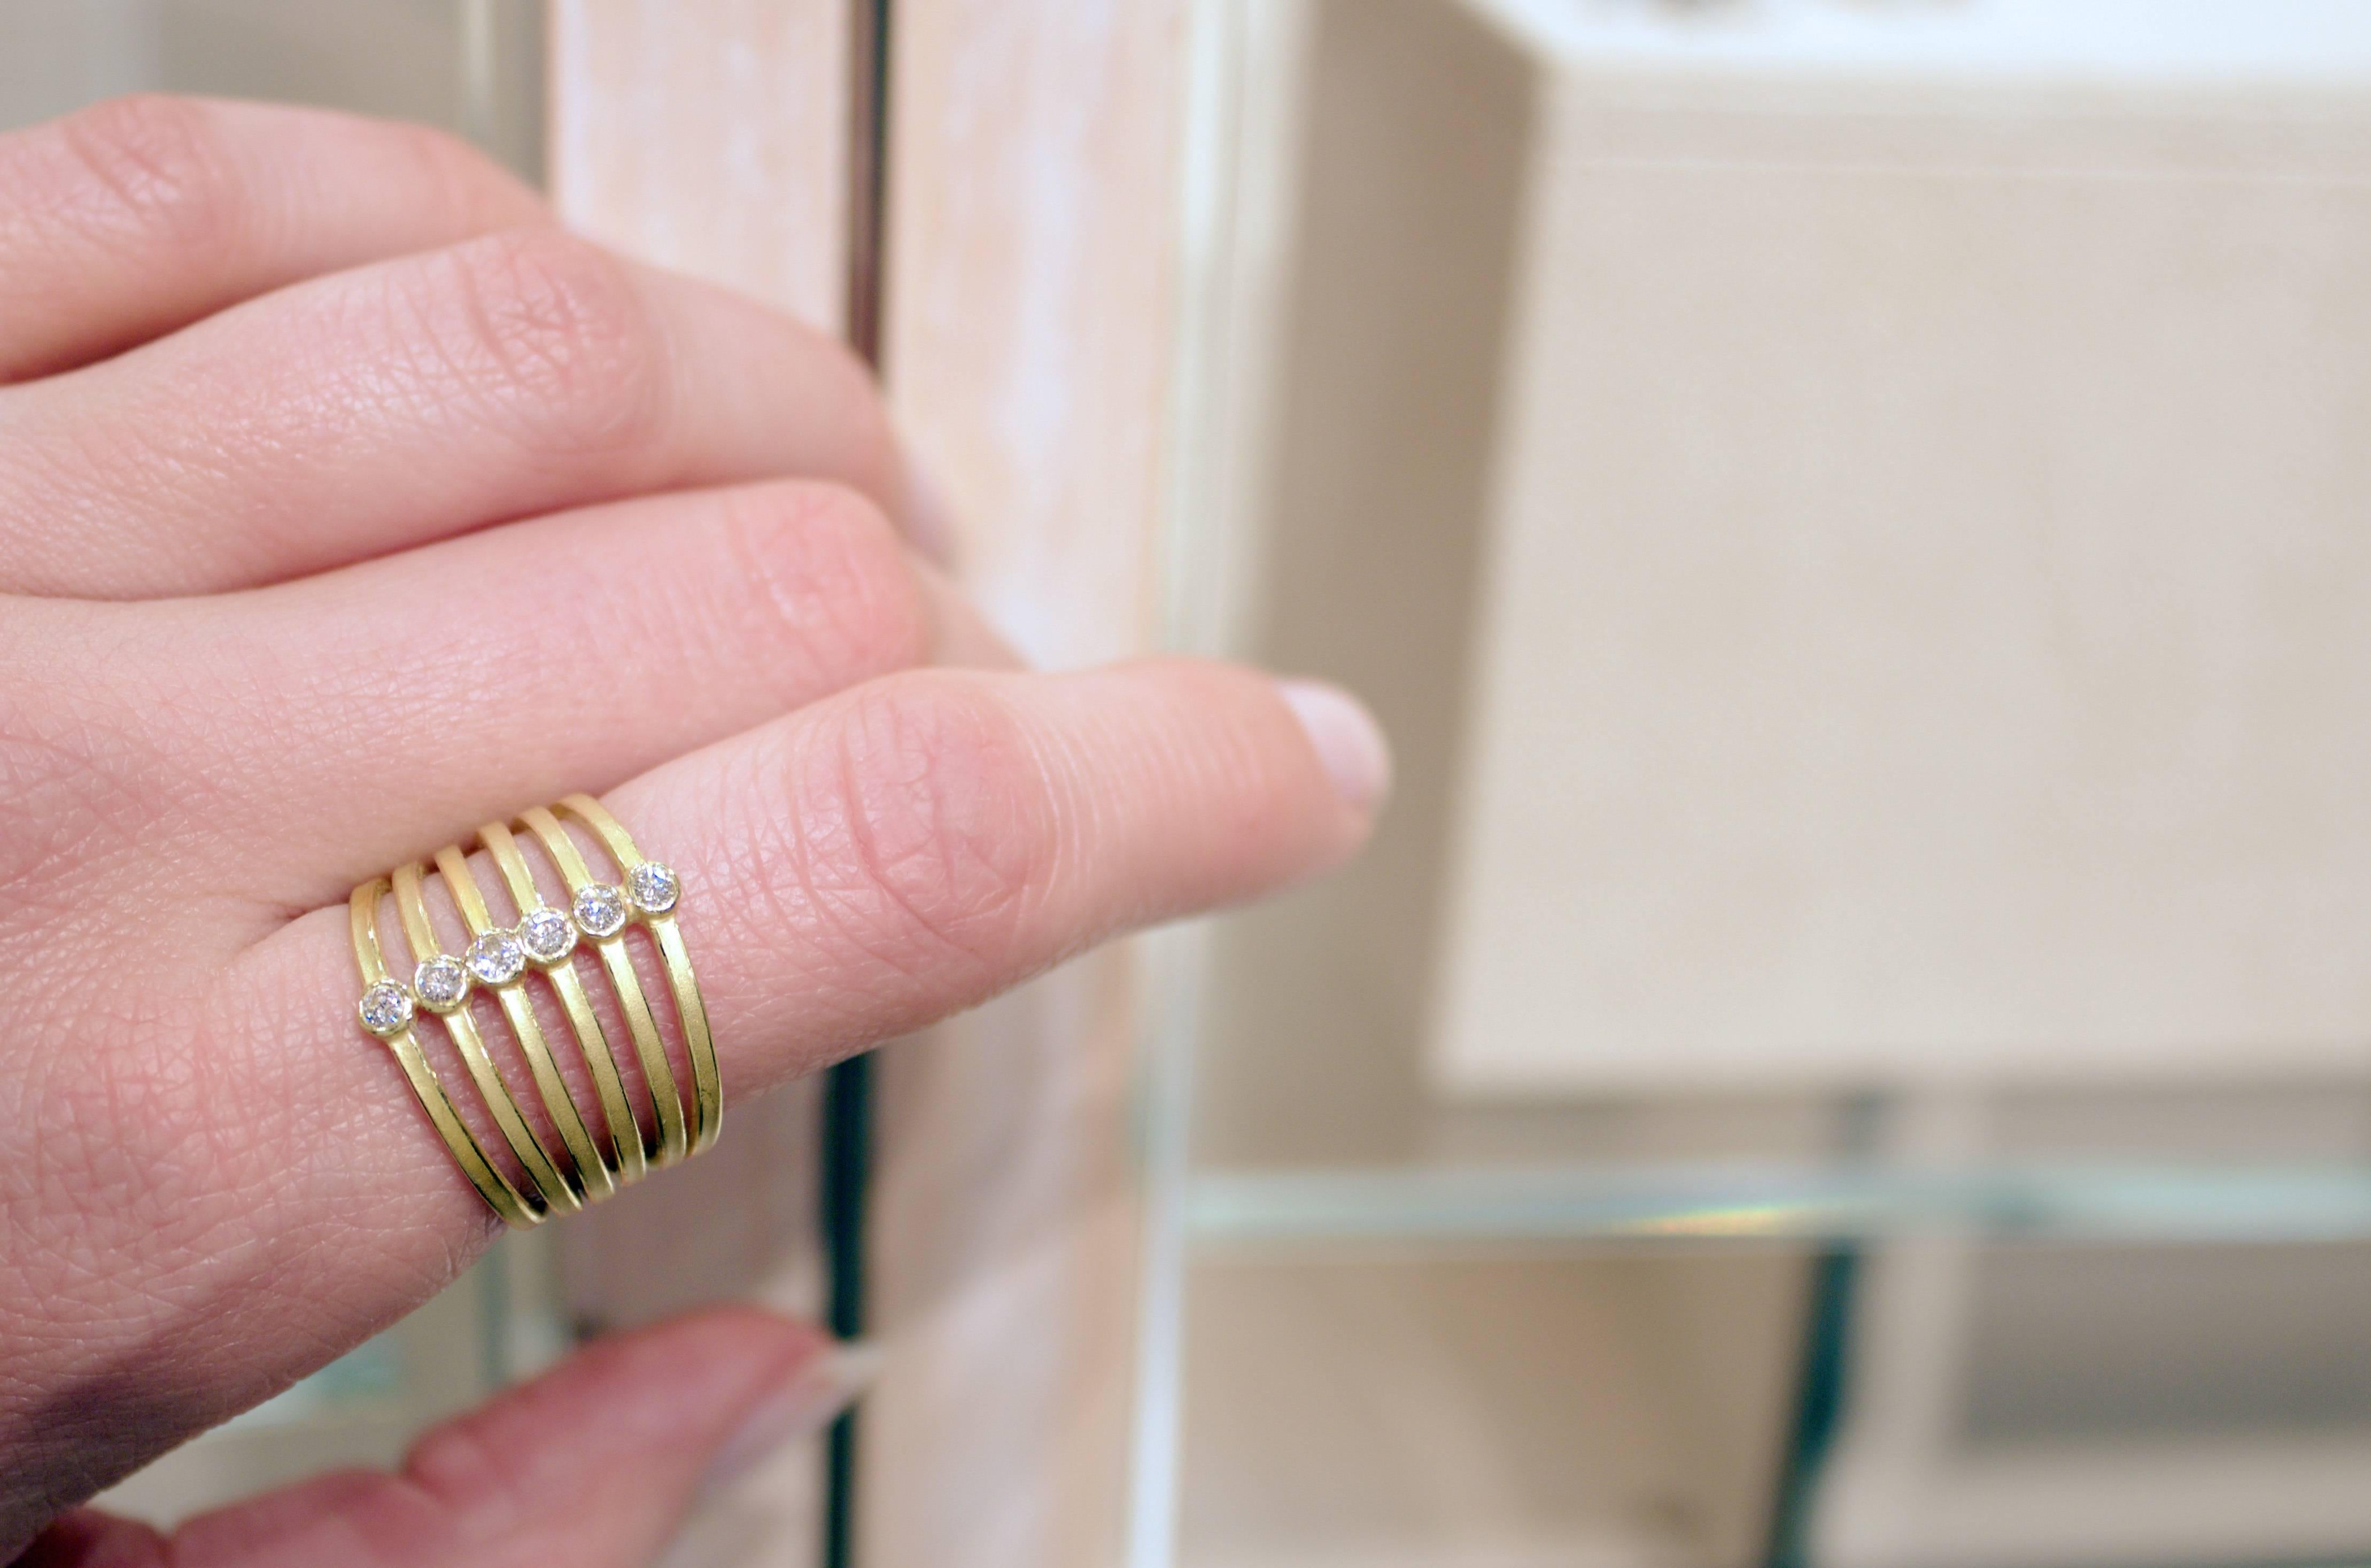 Barbara Heinrich White Diamond Gold Zipper Ring For Sale at 1stdibs